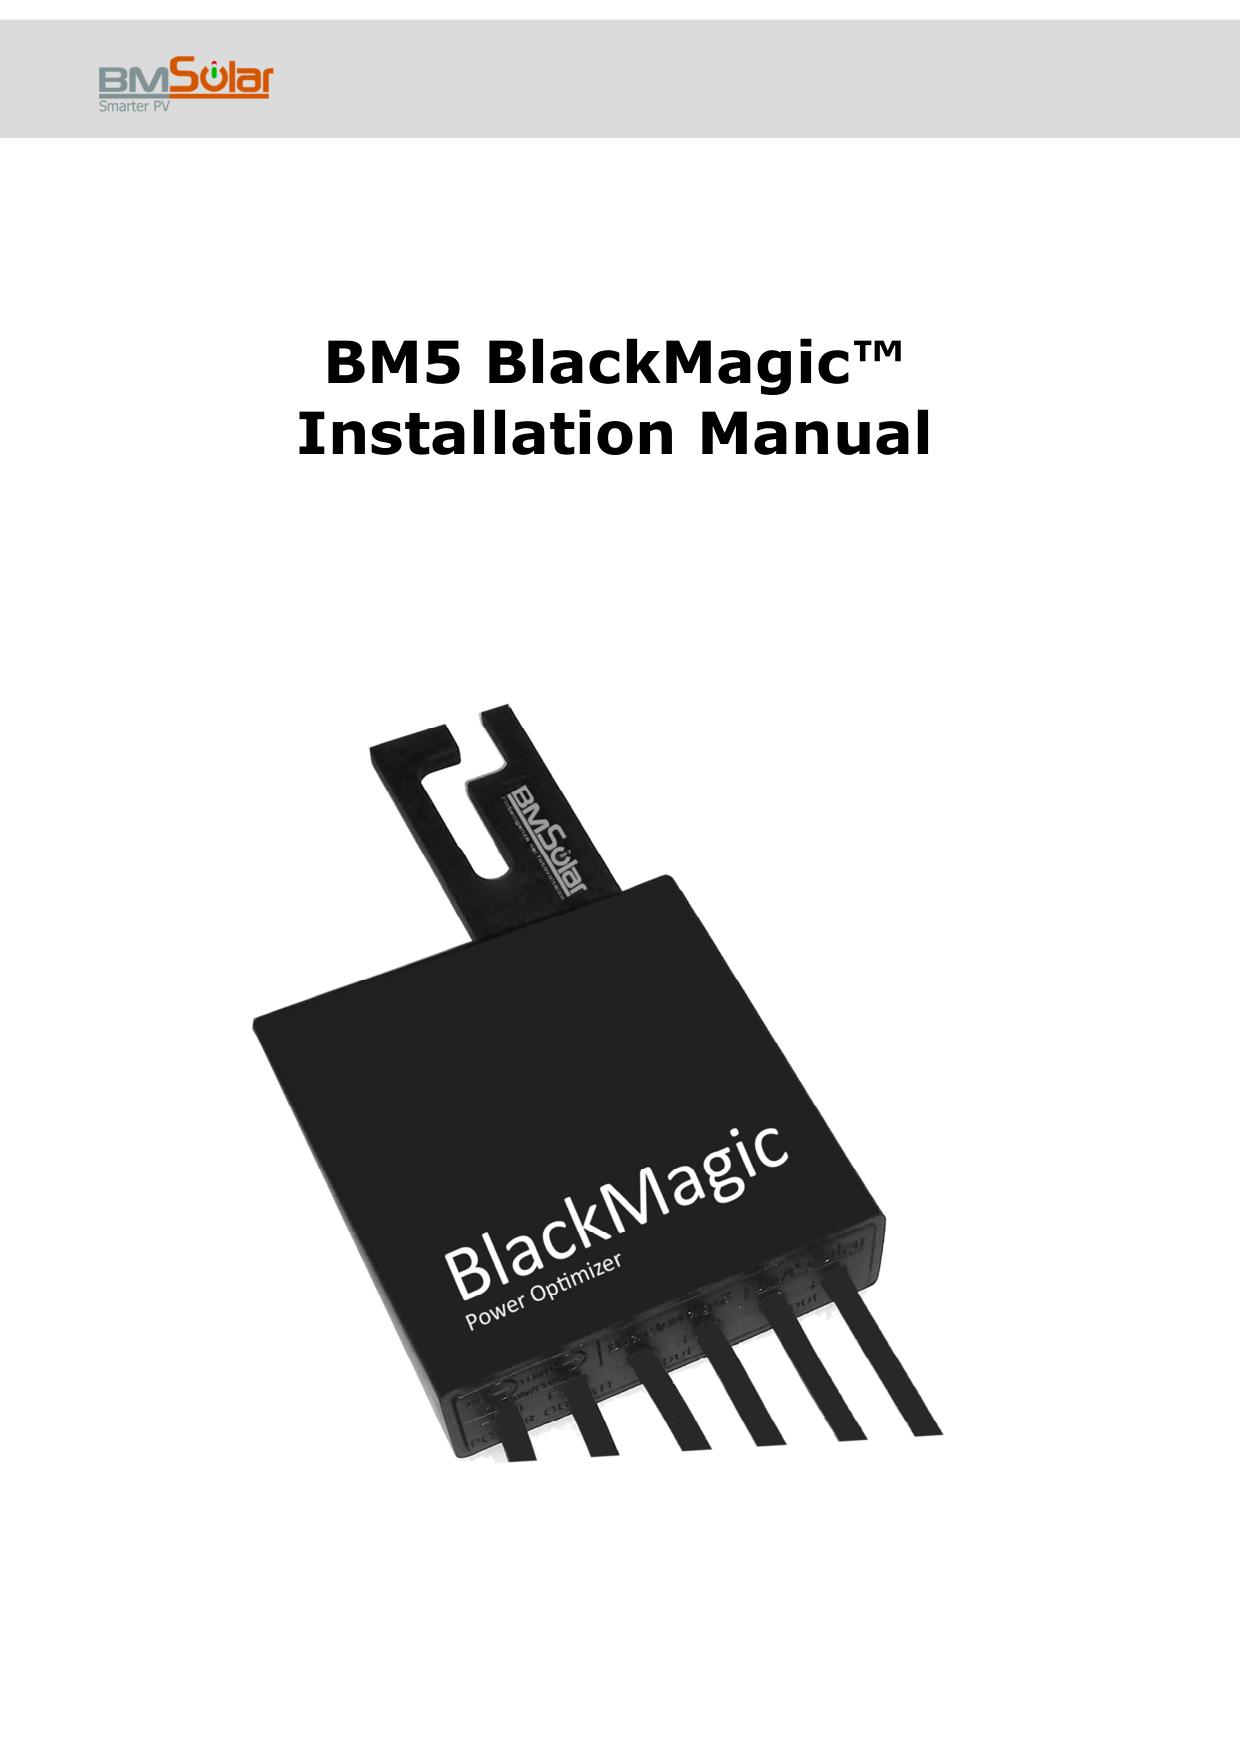 BM5 BlackMagic™ Installation Manual | manualzz com